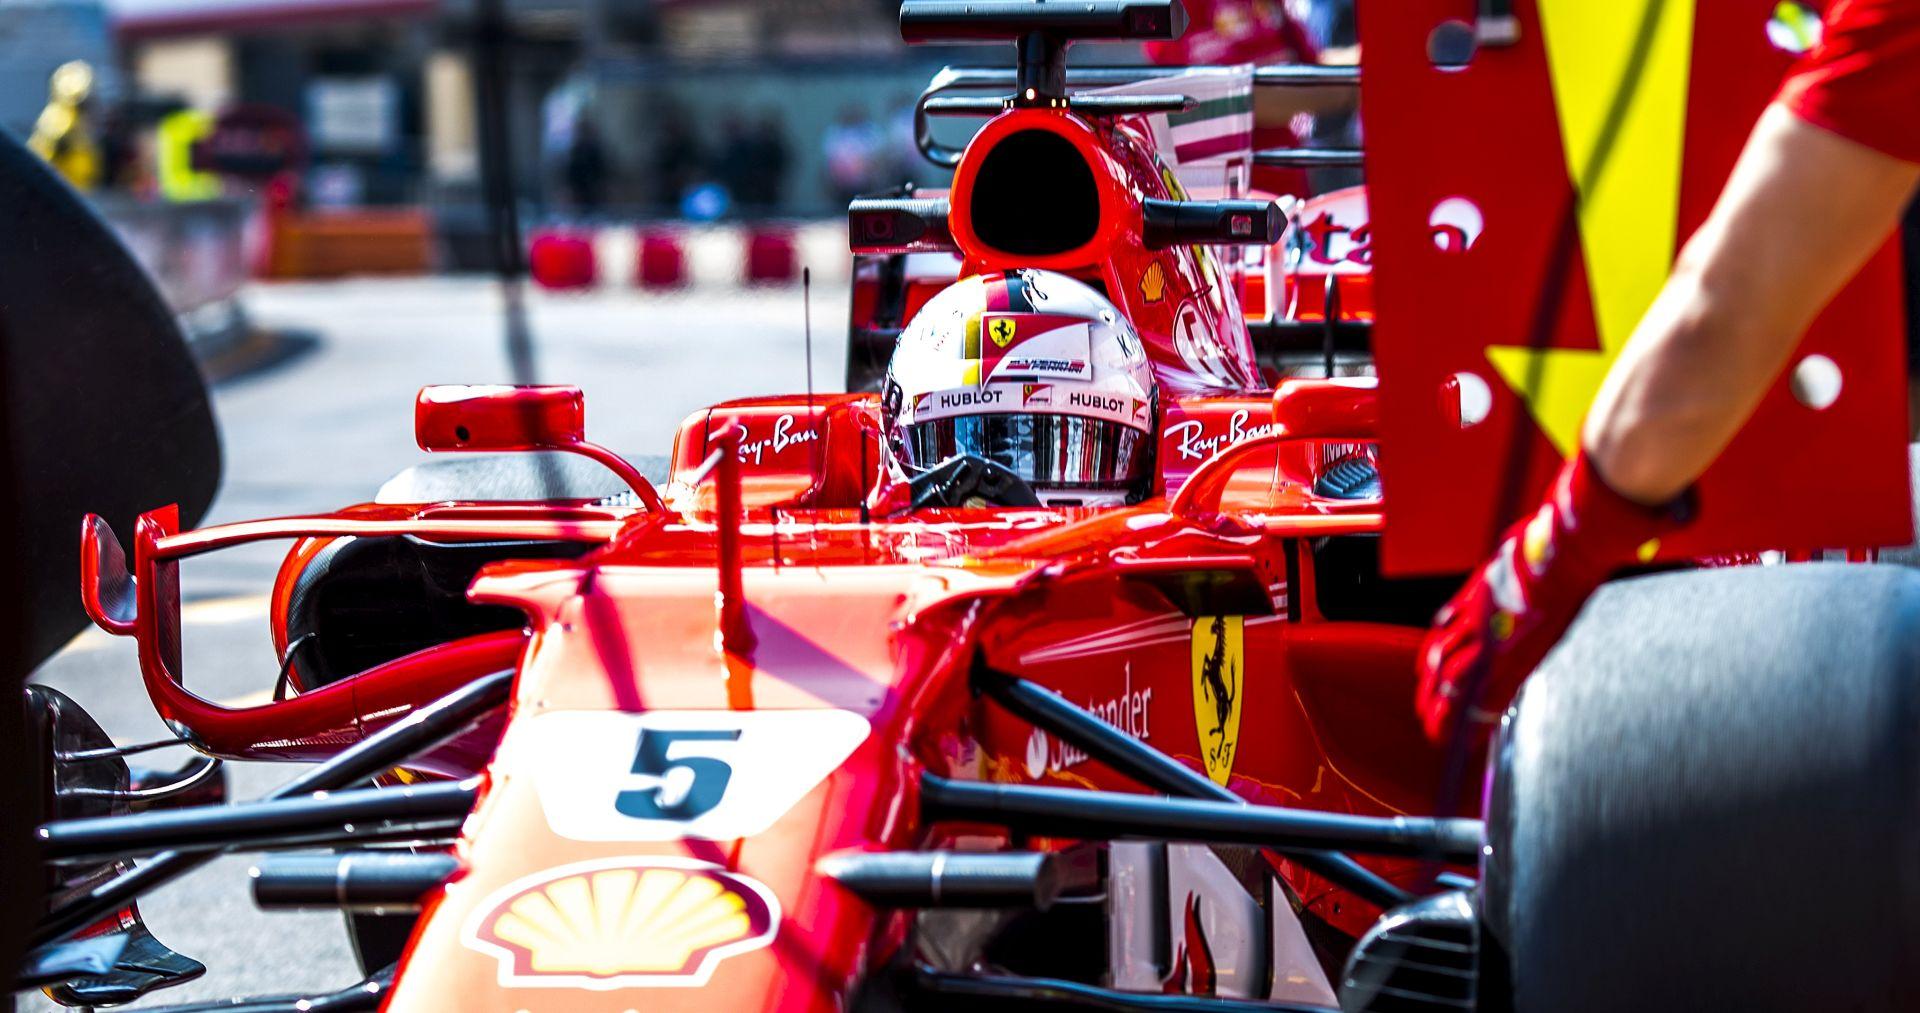 FORMULA 1 Vettel donio prvu pobjedu Ferrariju u Monaku nakon 2001.